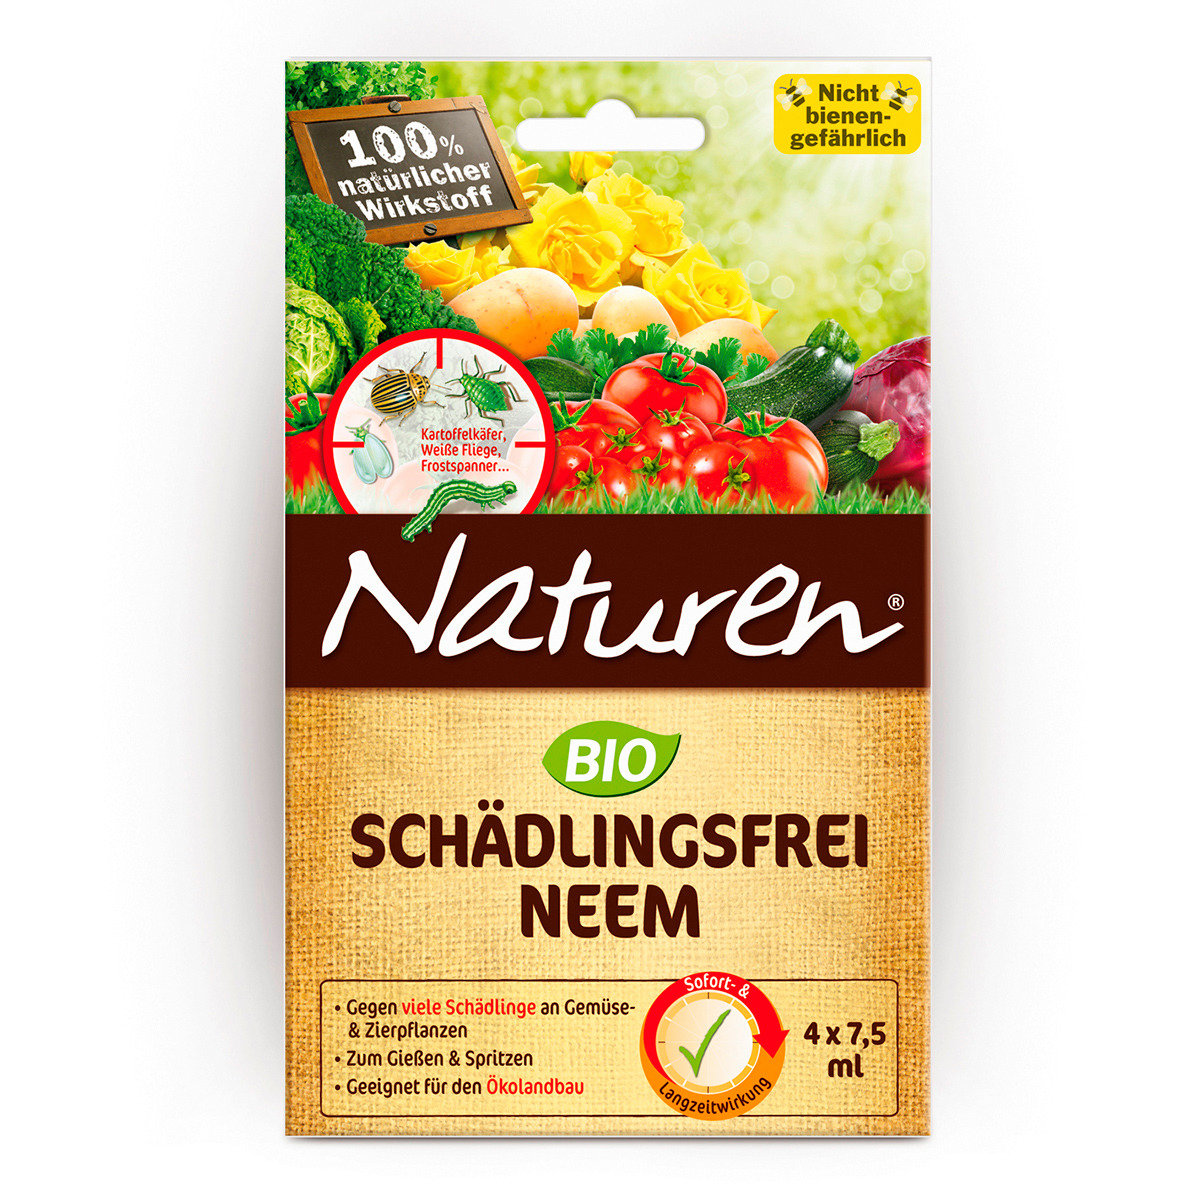 Naturen Bio Schädlingsfrei Neem, 4 x 7,5 g